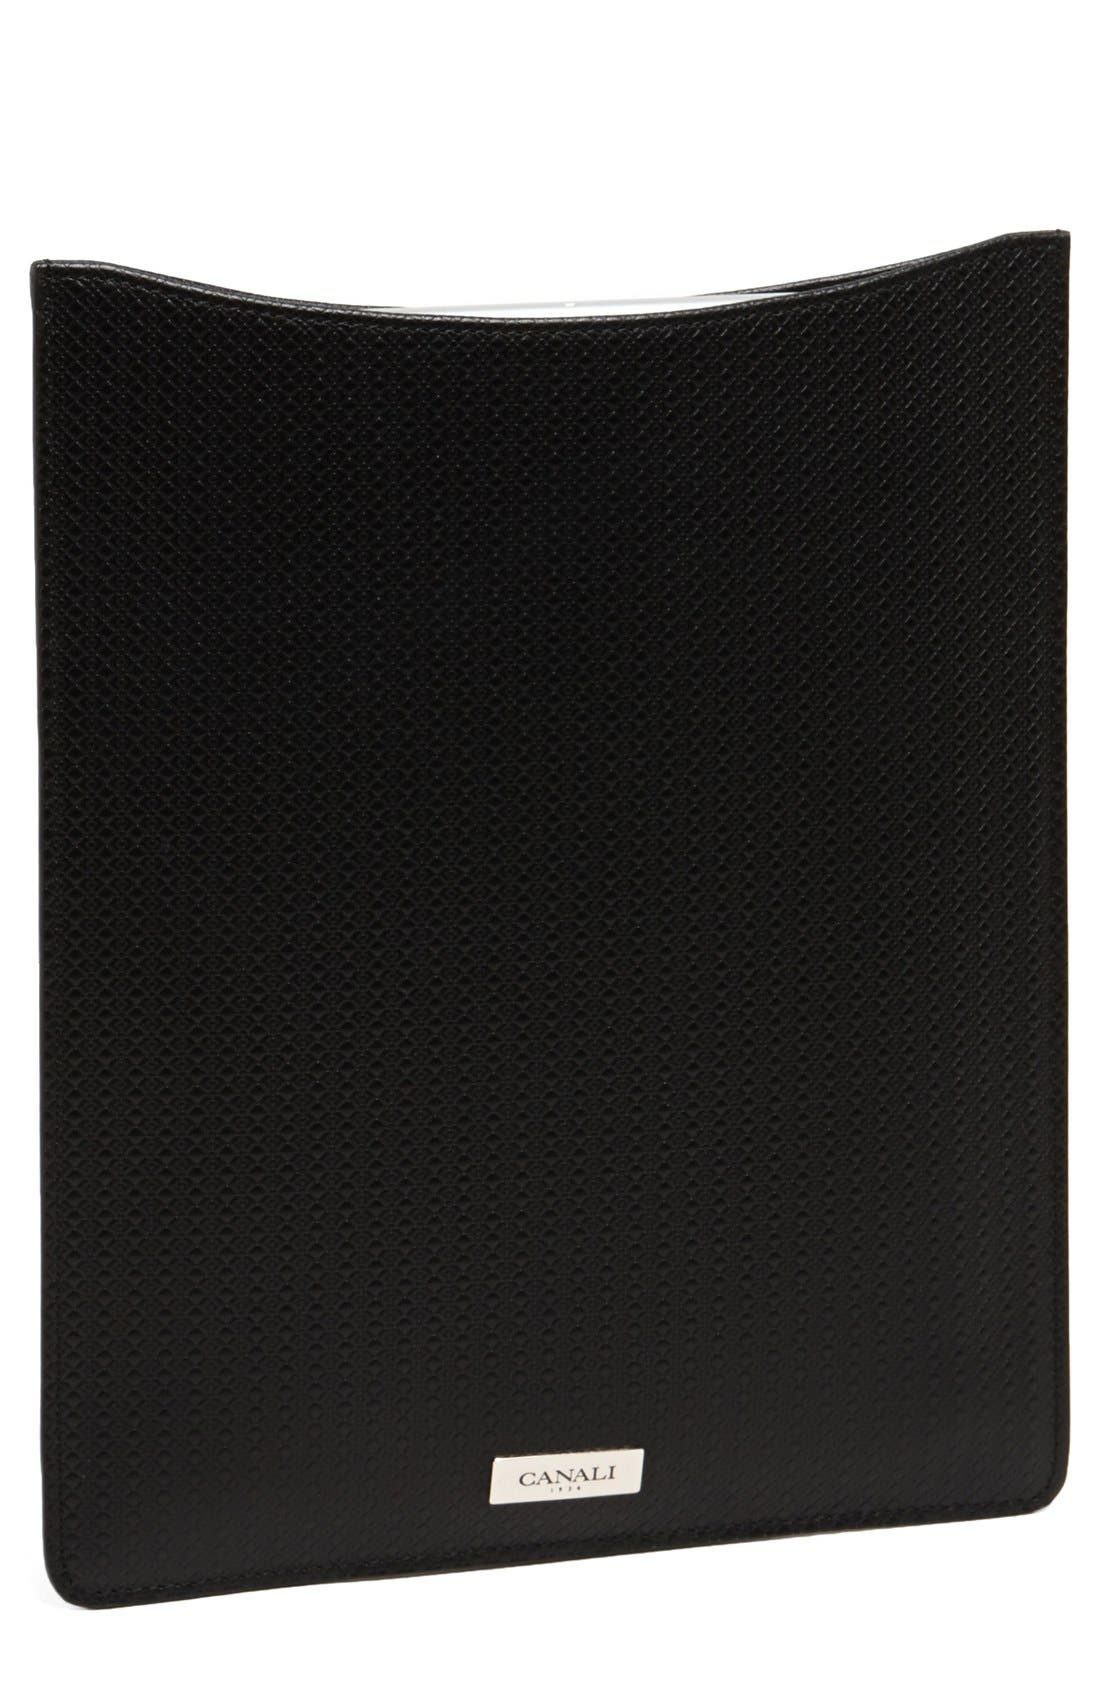 Alternate Image 1 Selected - Canali Leather iPad Sleeve